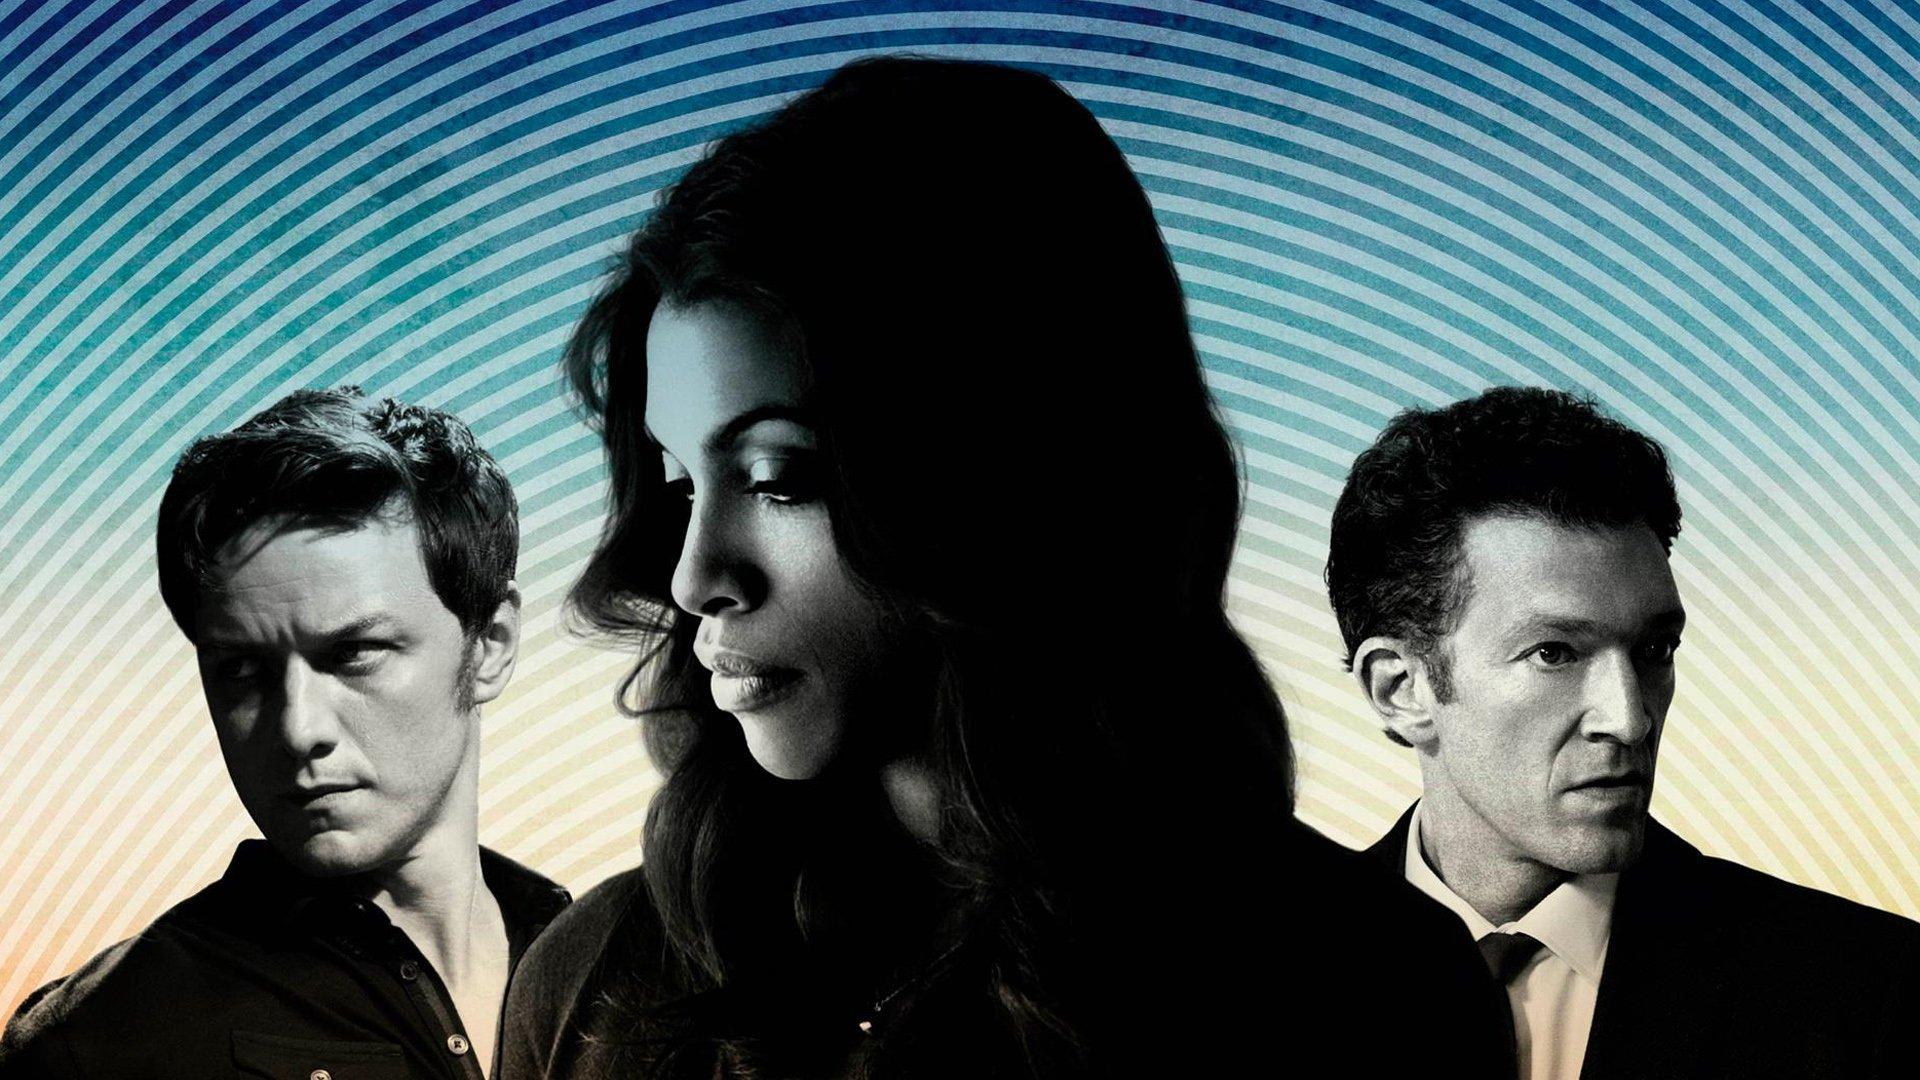 Movie - Trance  James McAvoy Vincent Cassel Rosario Dawson Wallpaper